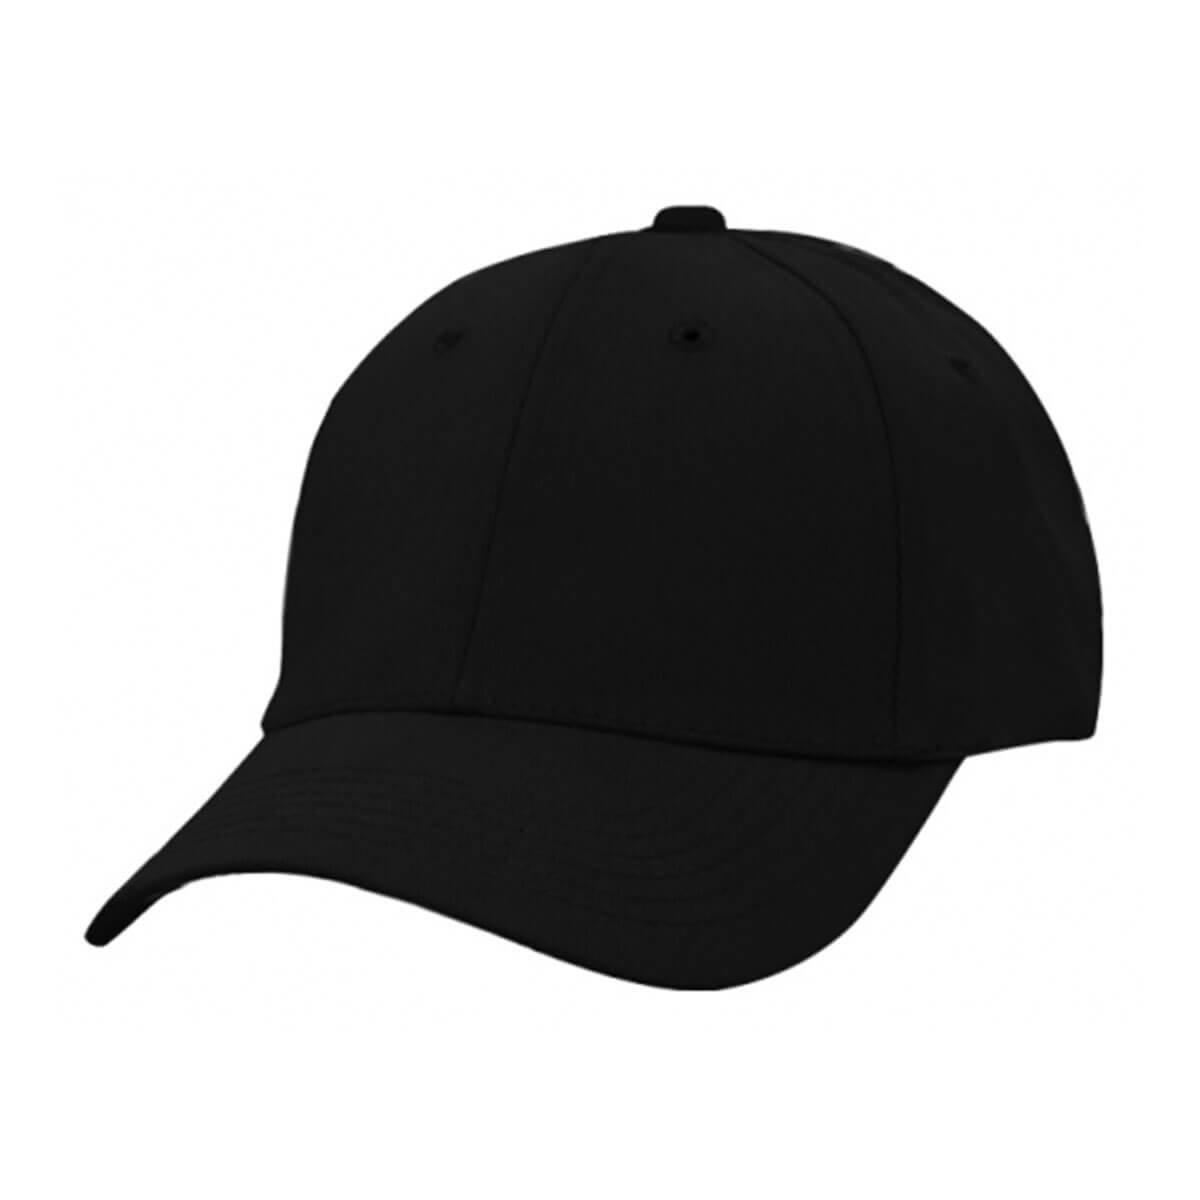 Heavy Brushed Cotton Cap-Black